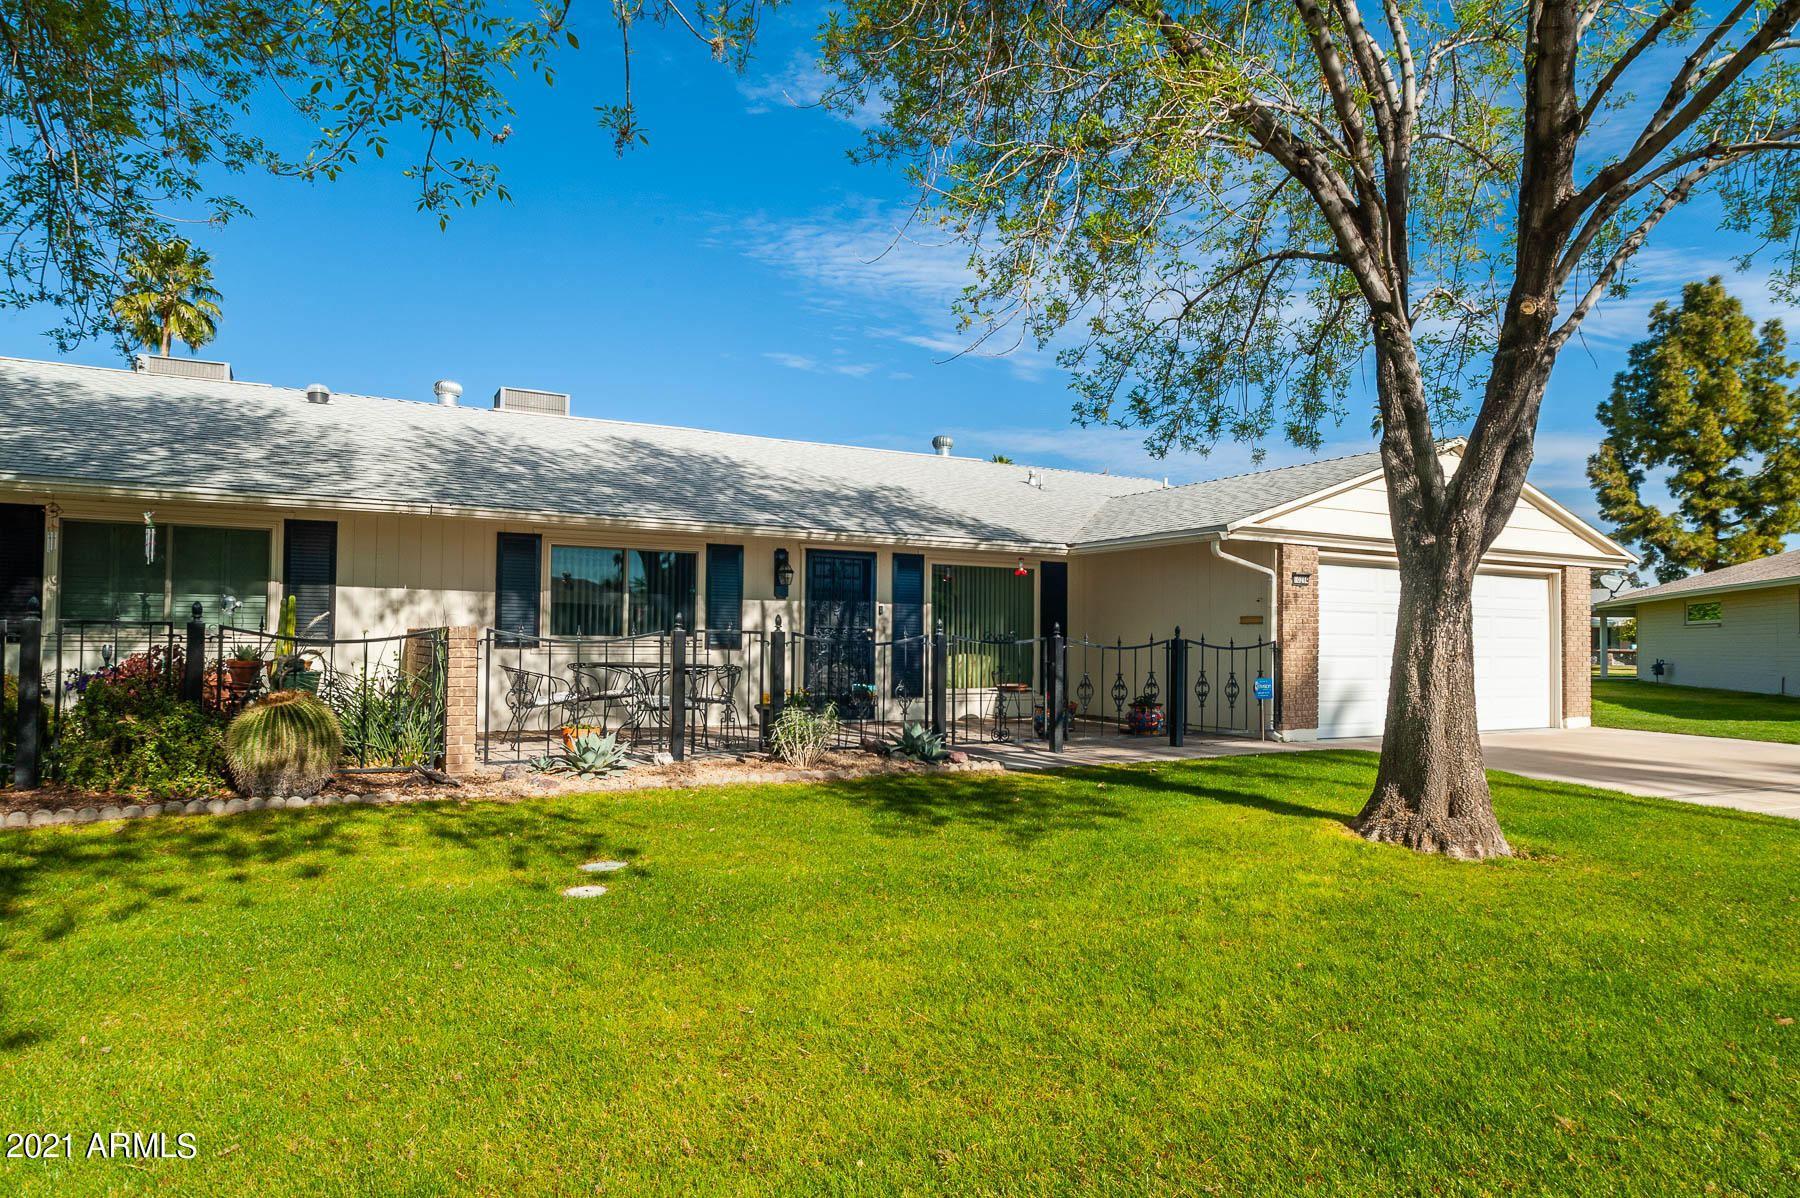 Photo of 10214 W FORRESTER Drive, Sun City, AZ 85351 (MLS # 6200288)